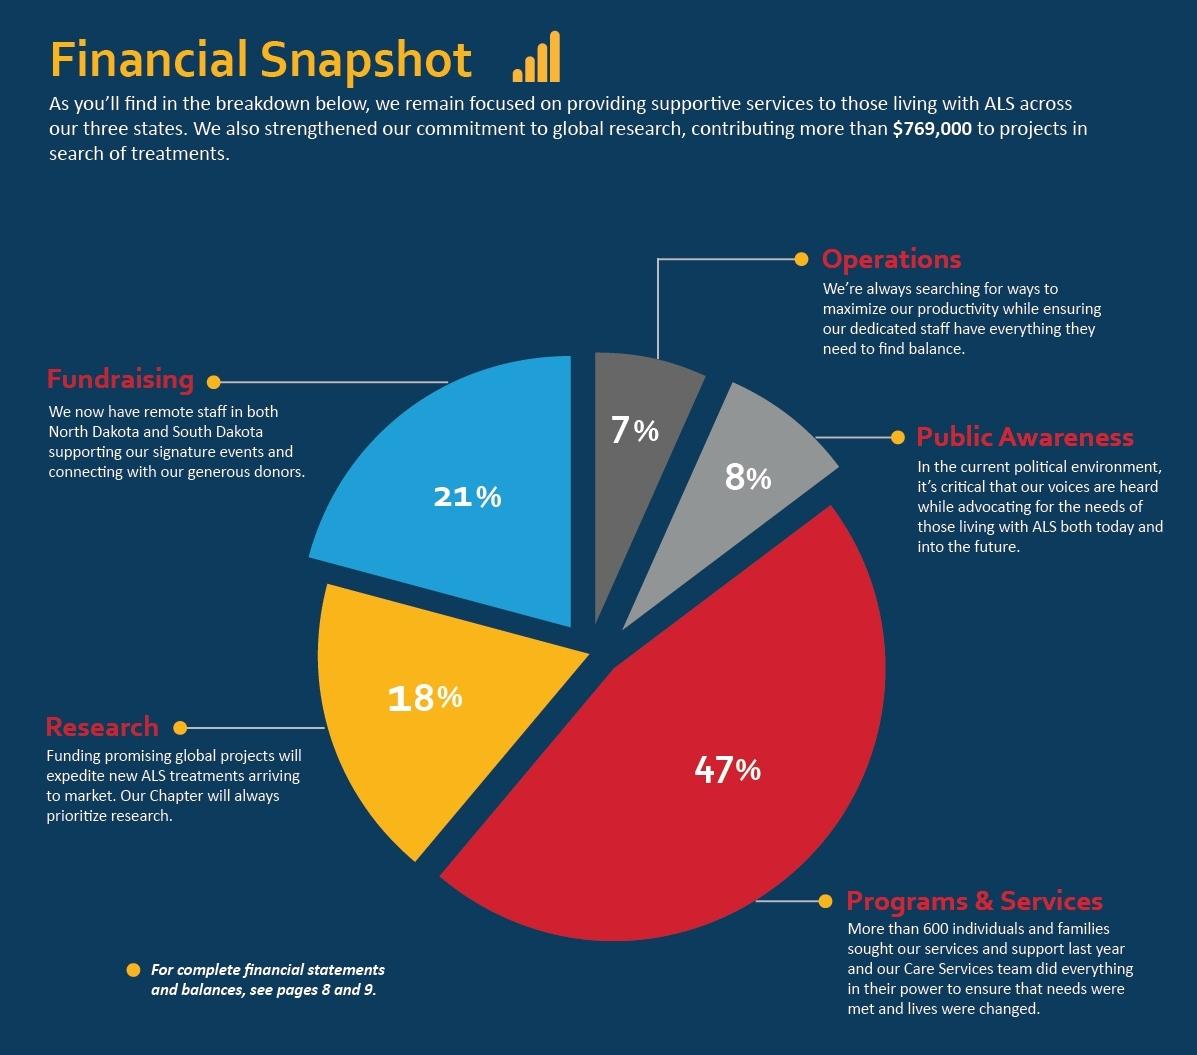 Financial Snapshot: The ALS Association Minnesota